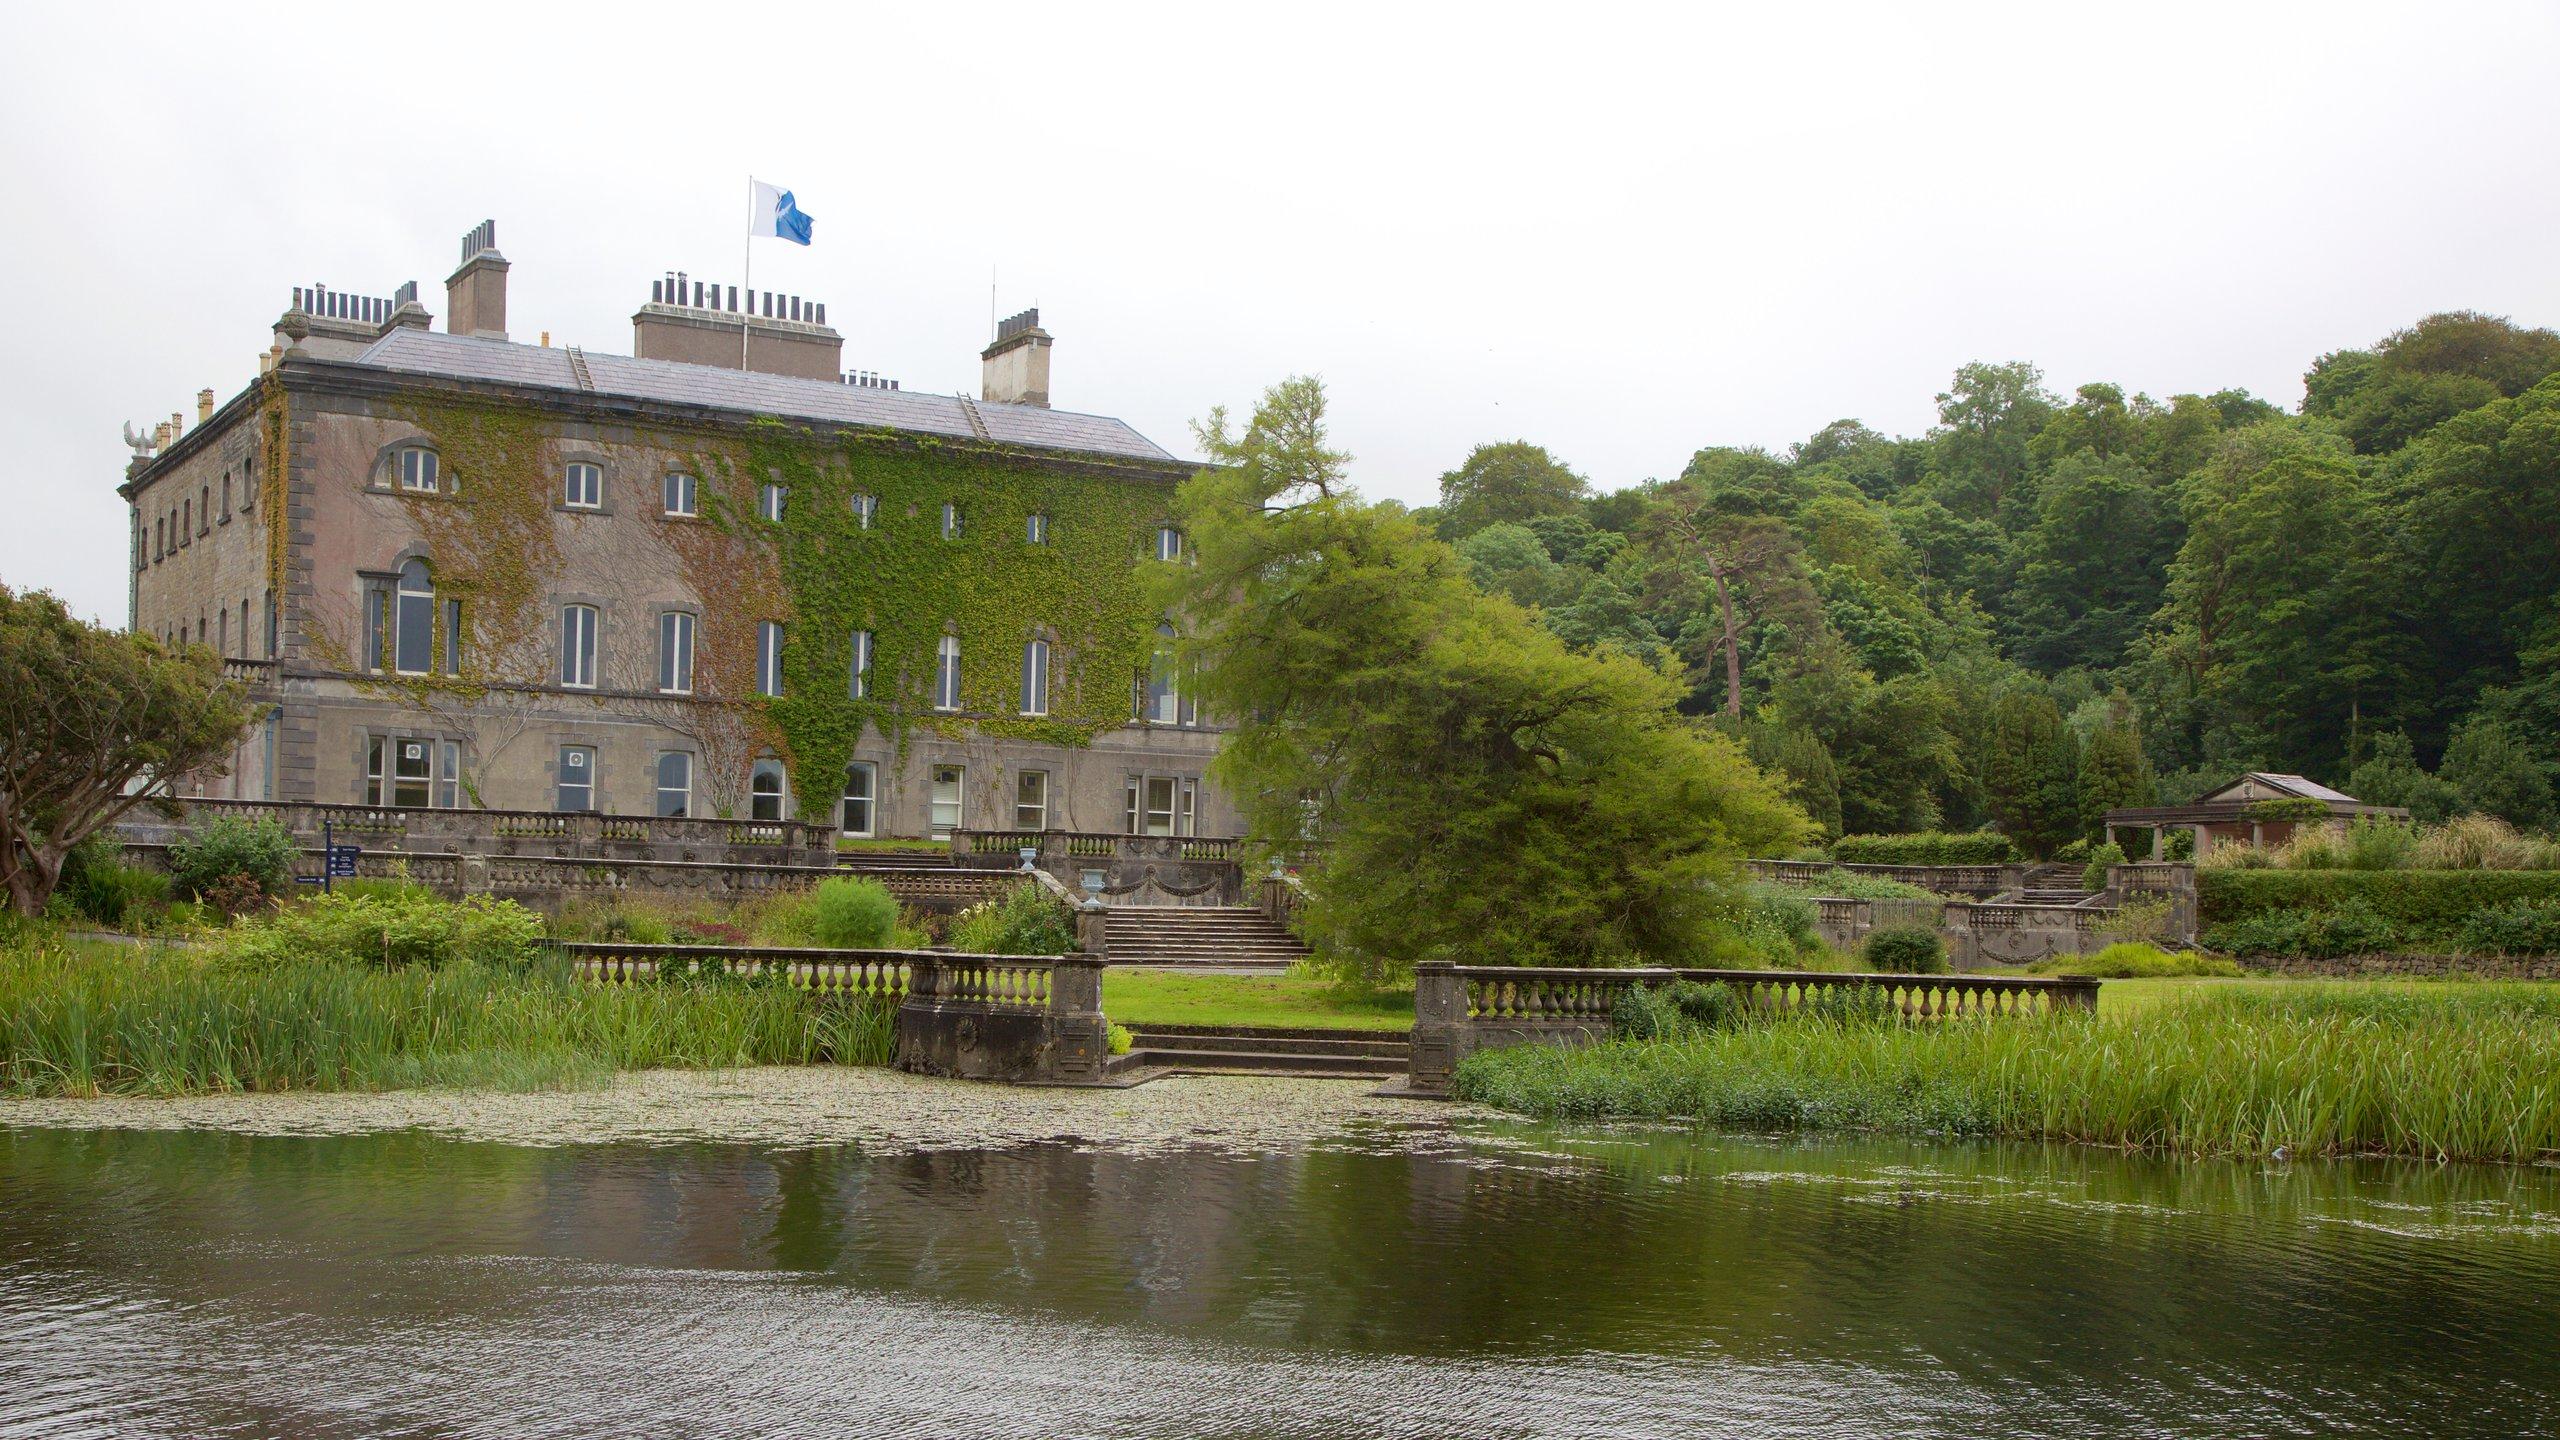 Westport House, Westport, County Mayo, Ireland